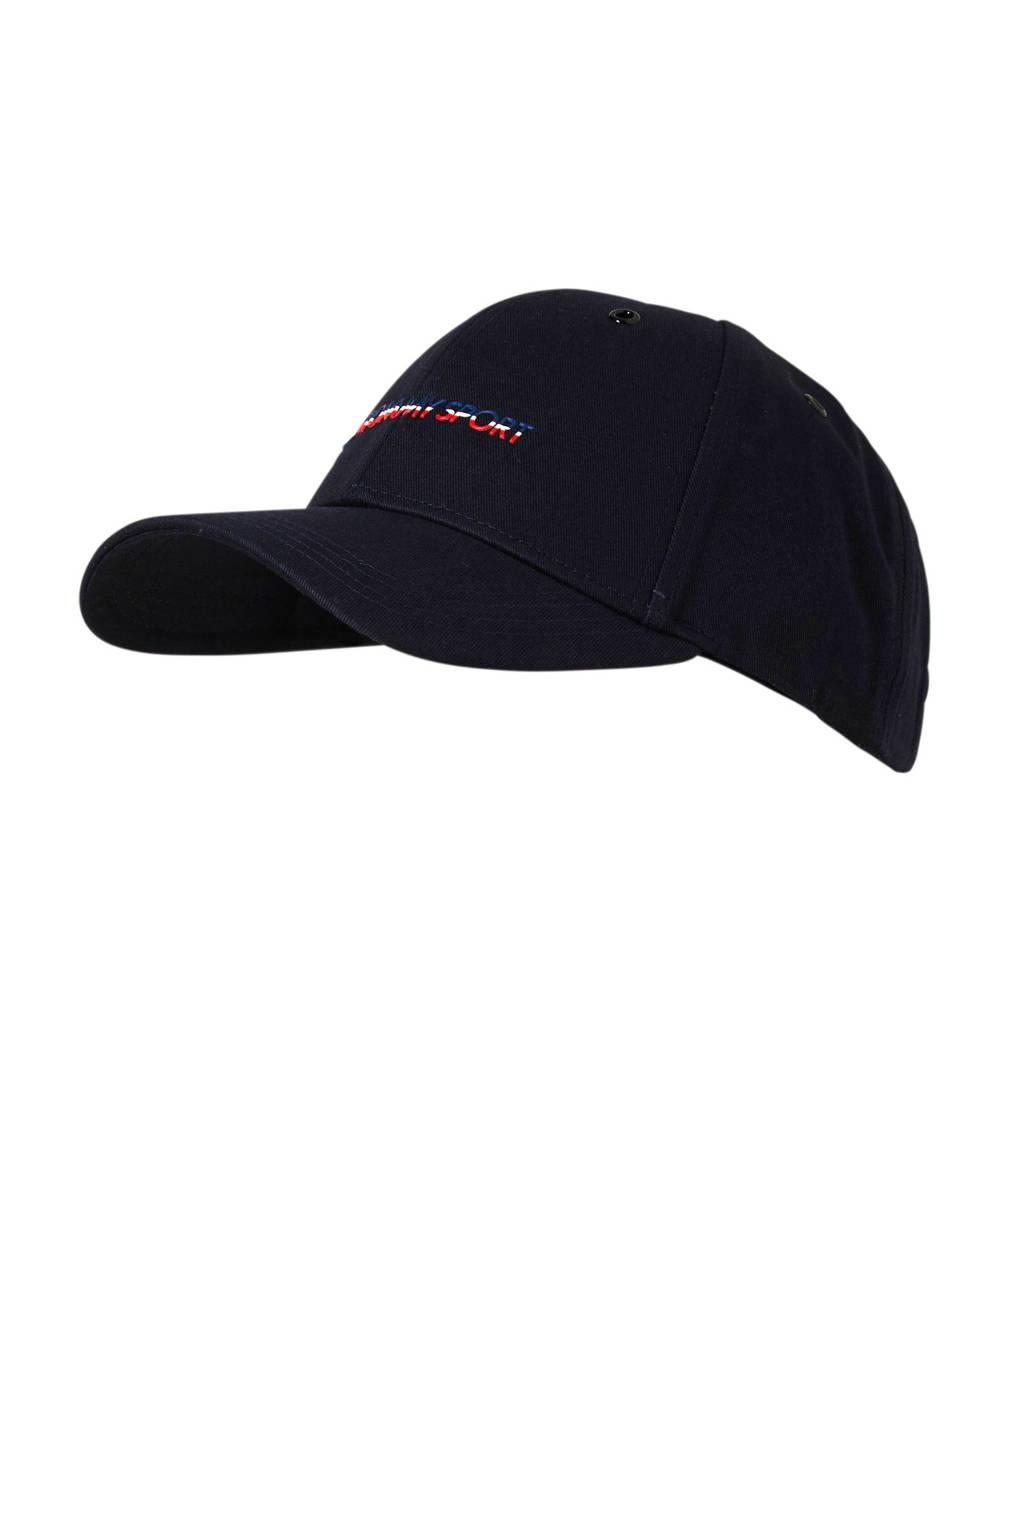 Tommy Hilfiger Sport cap donkerblauw, Donkerblauw